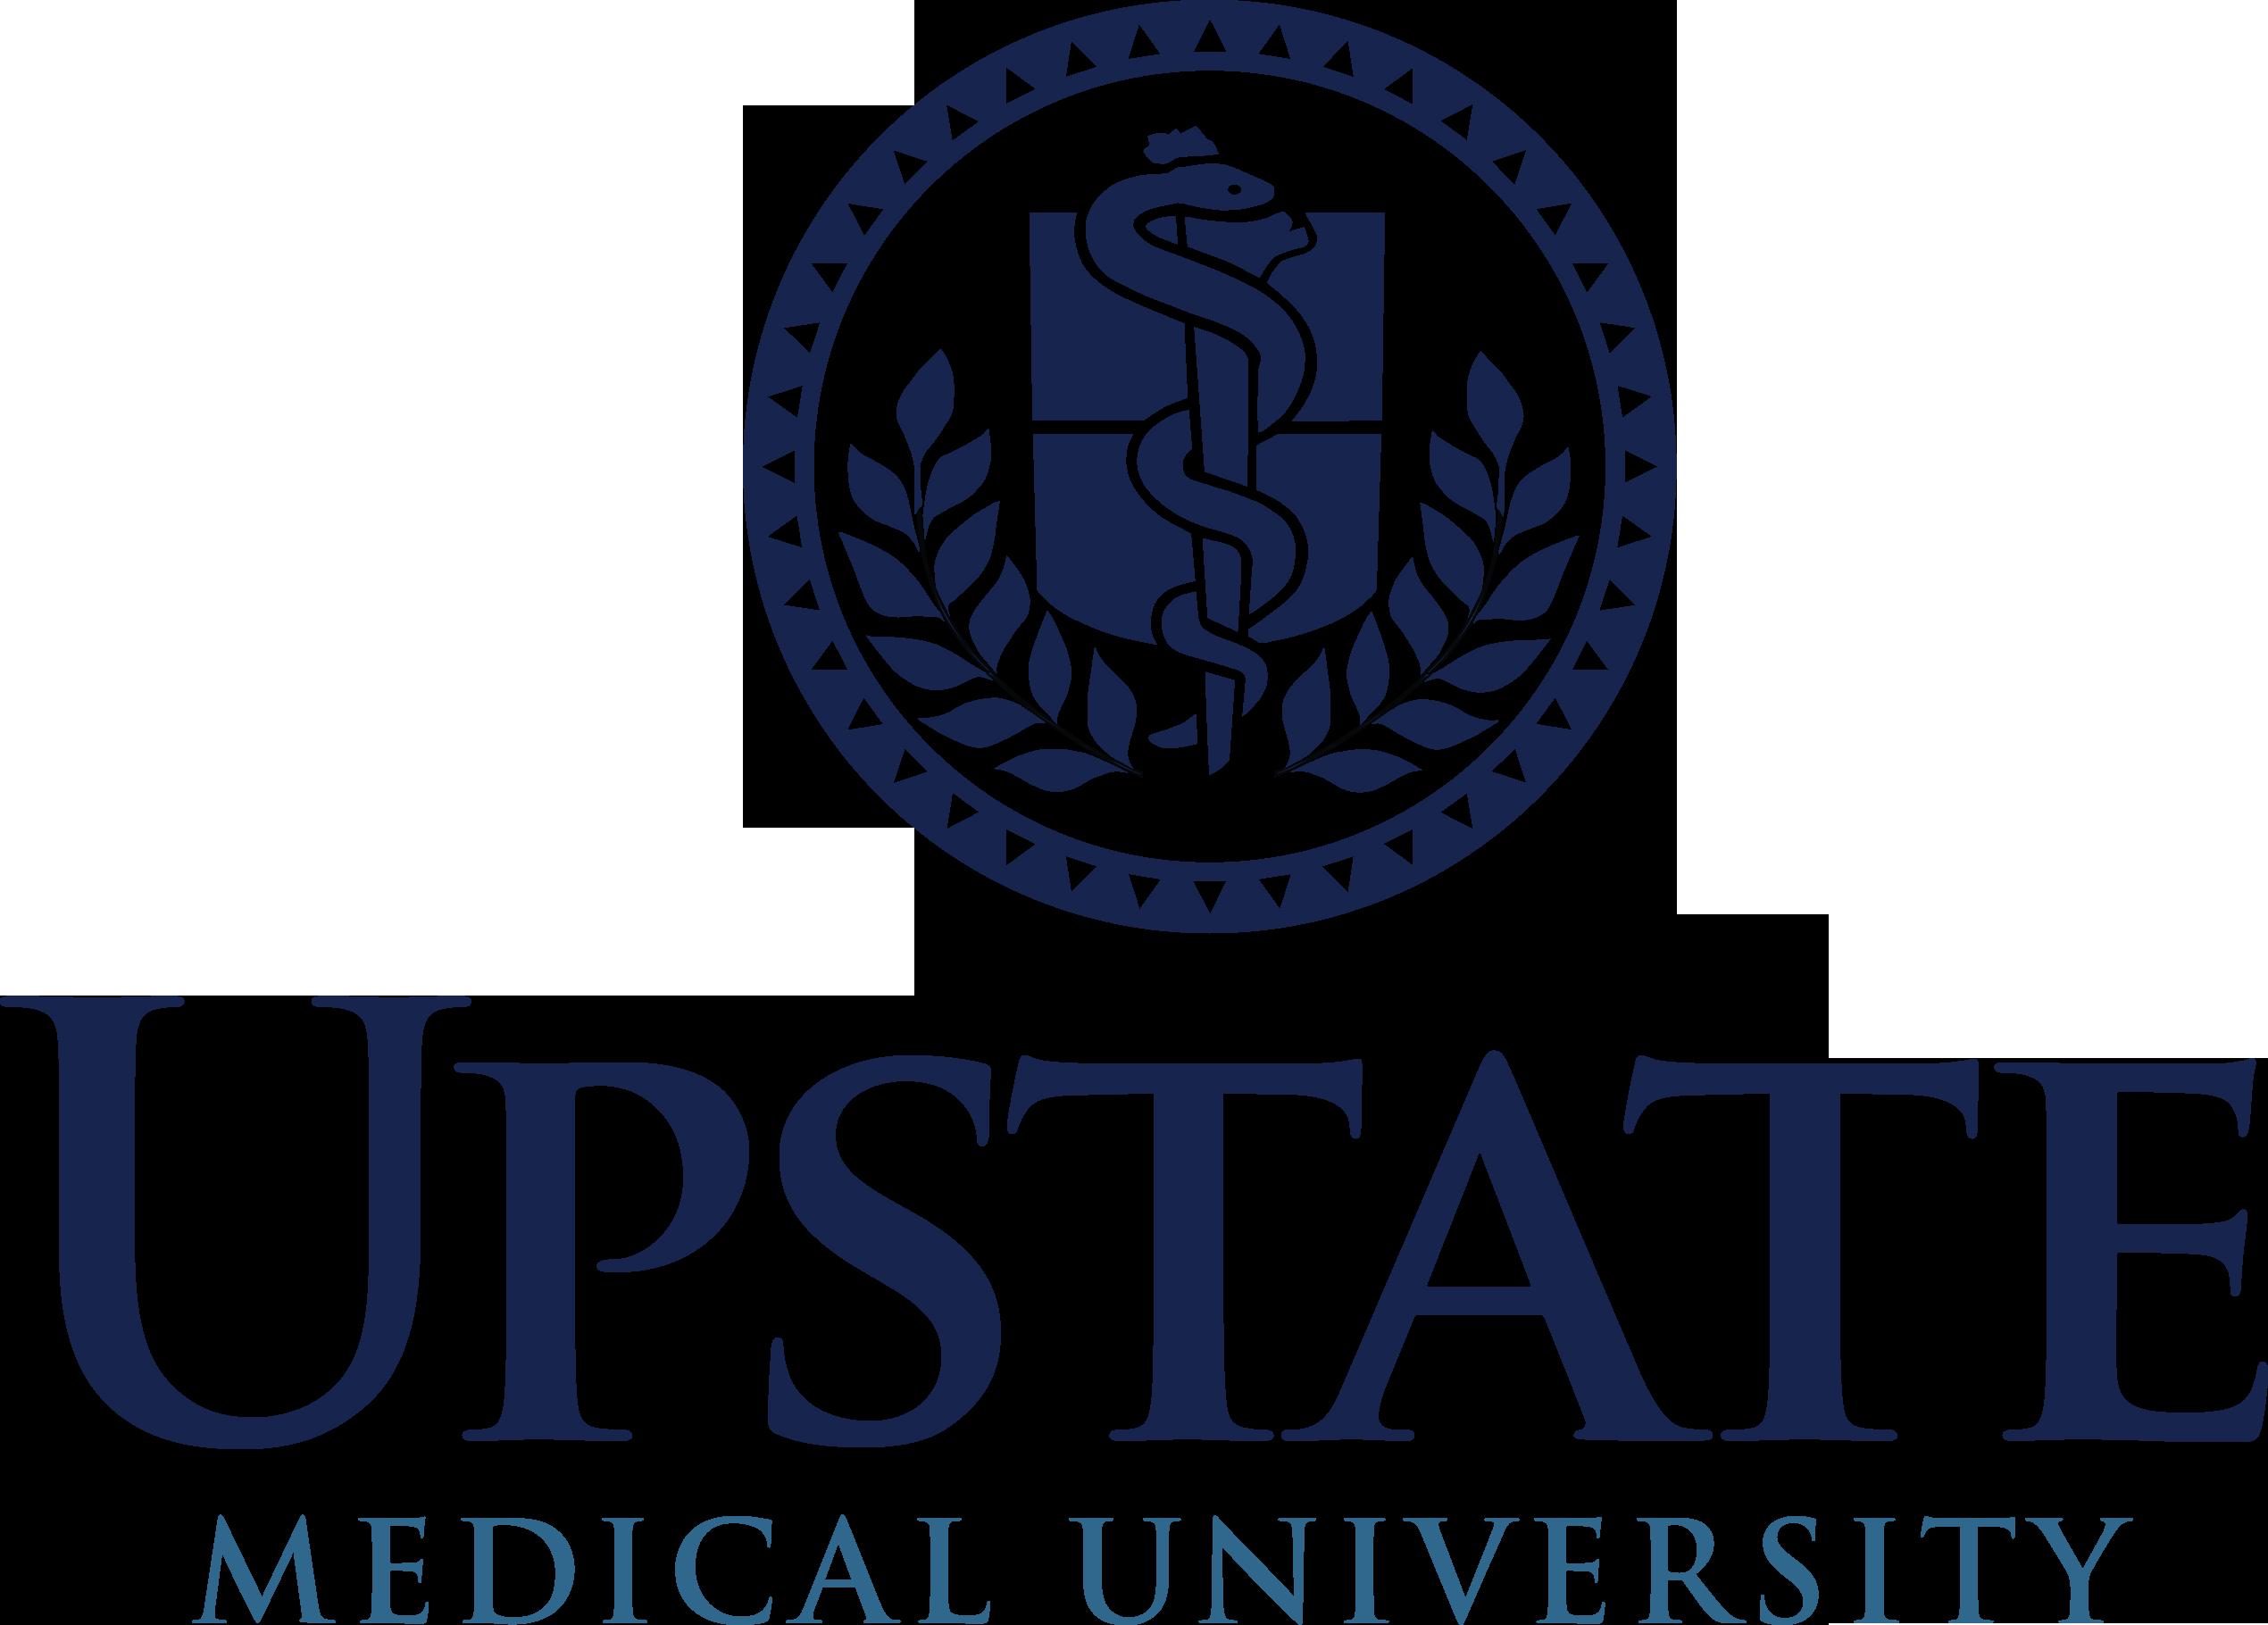 Upstate Logos Marketing Communications Suny Upstate Medical